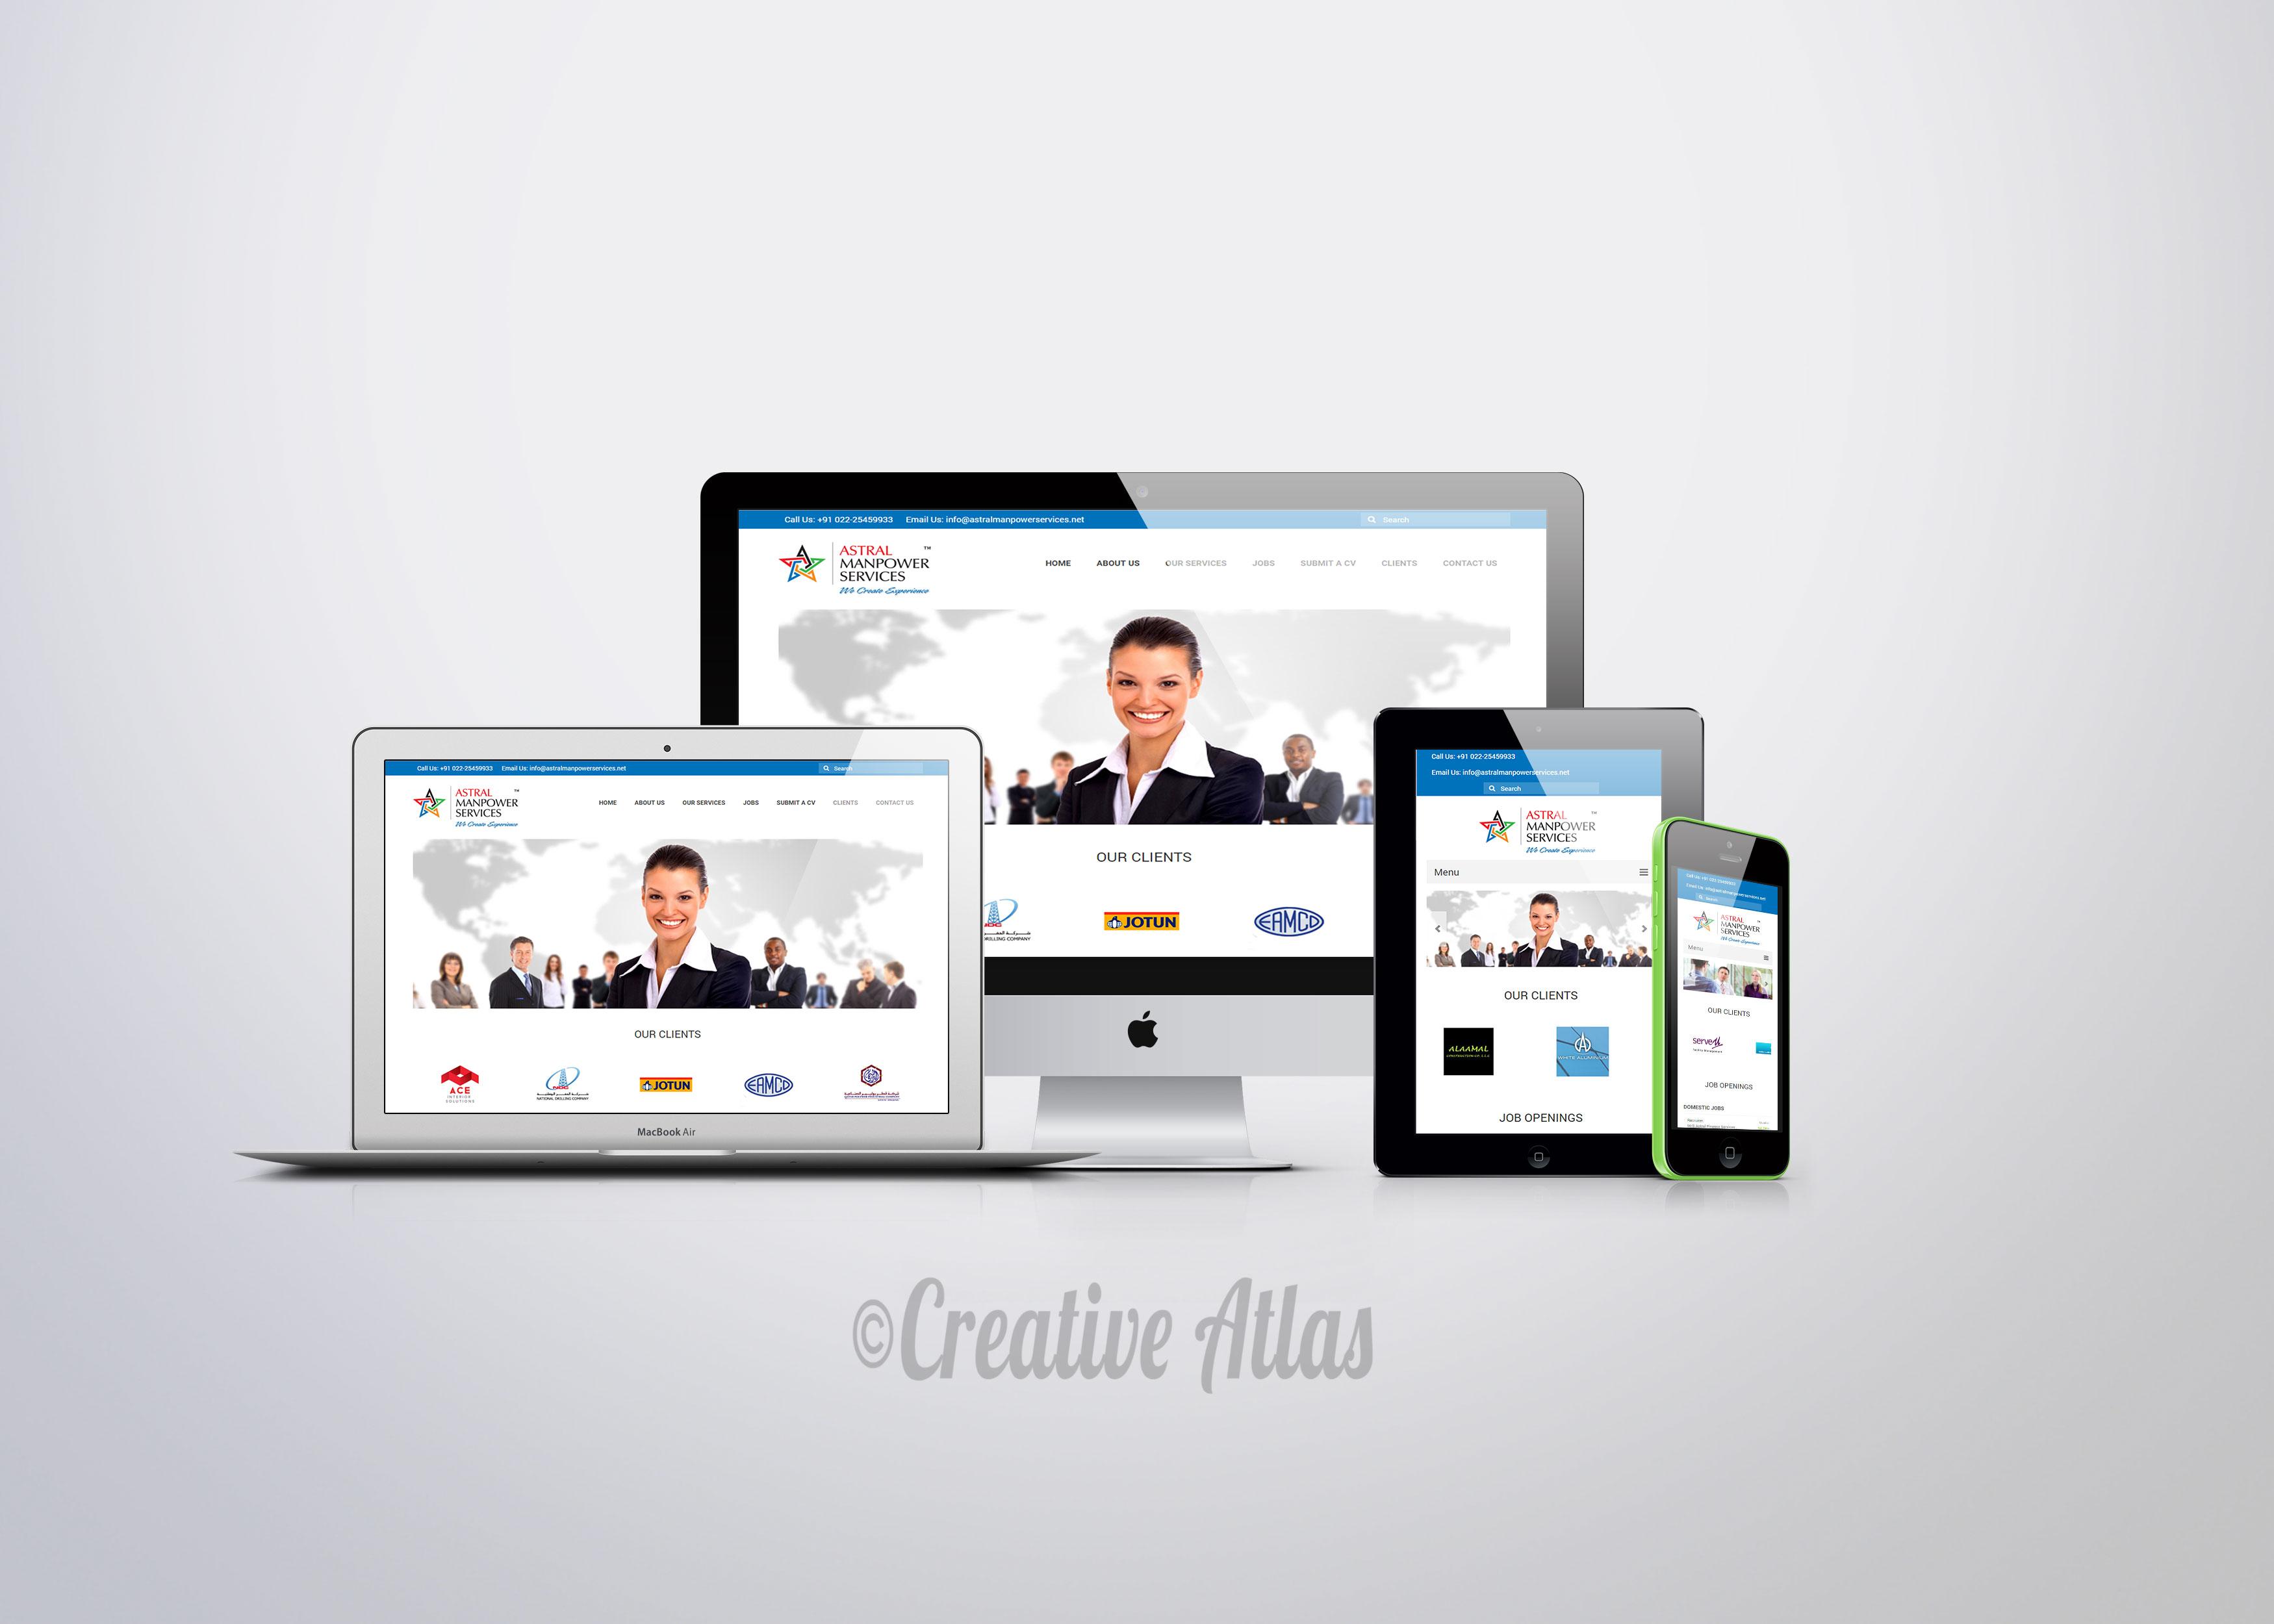 web-design-and-development-website-redesign-seo-services-blog-design